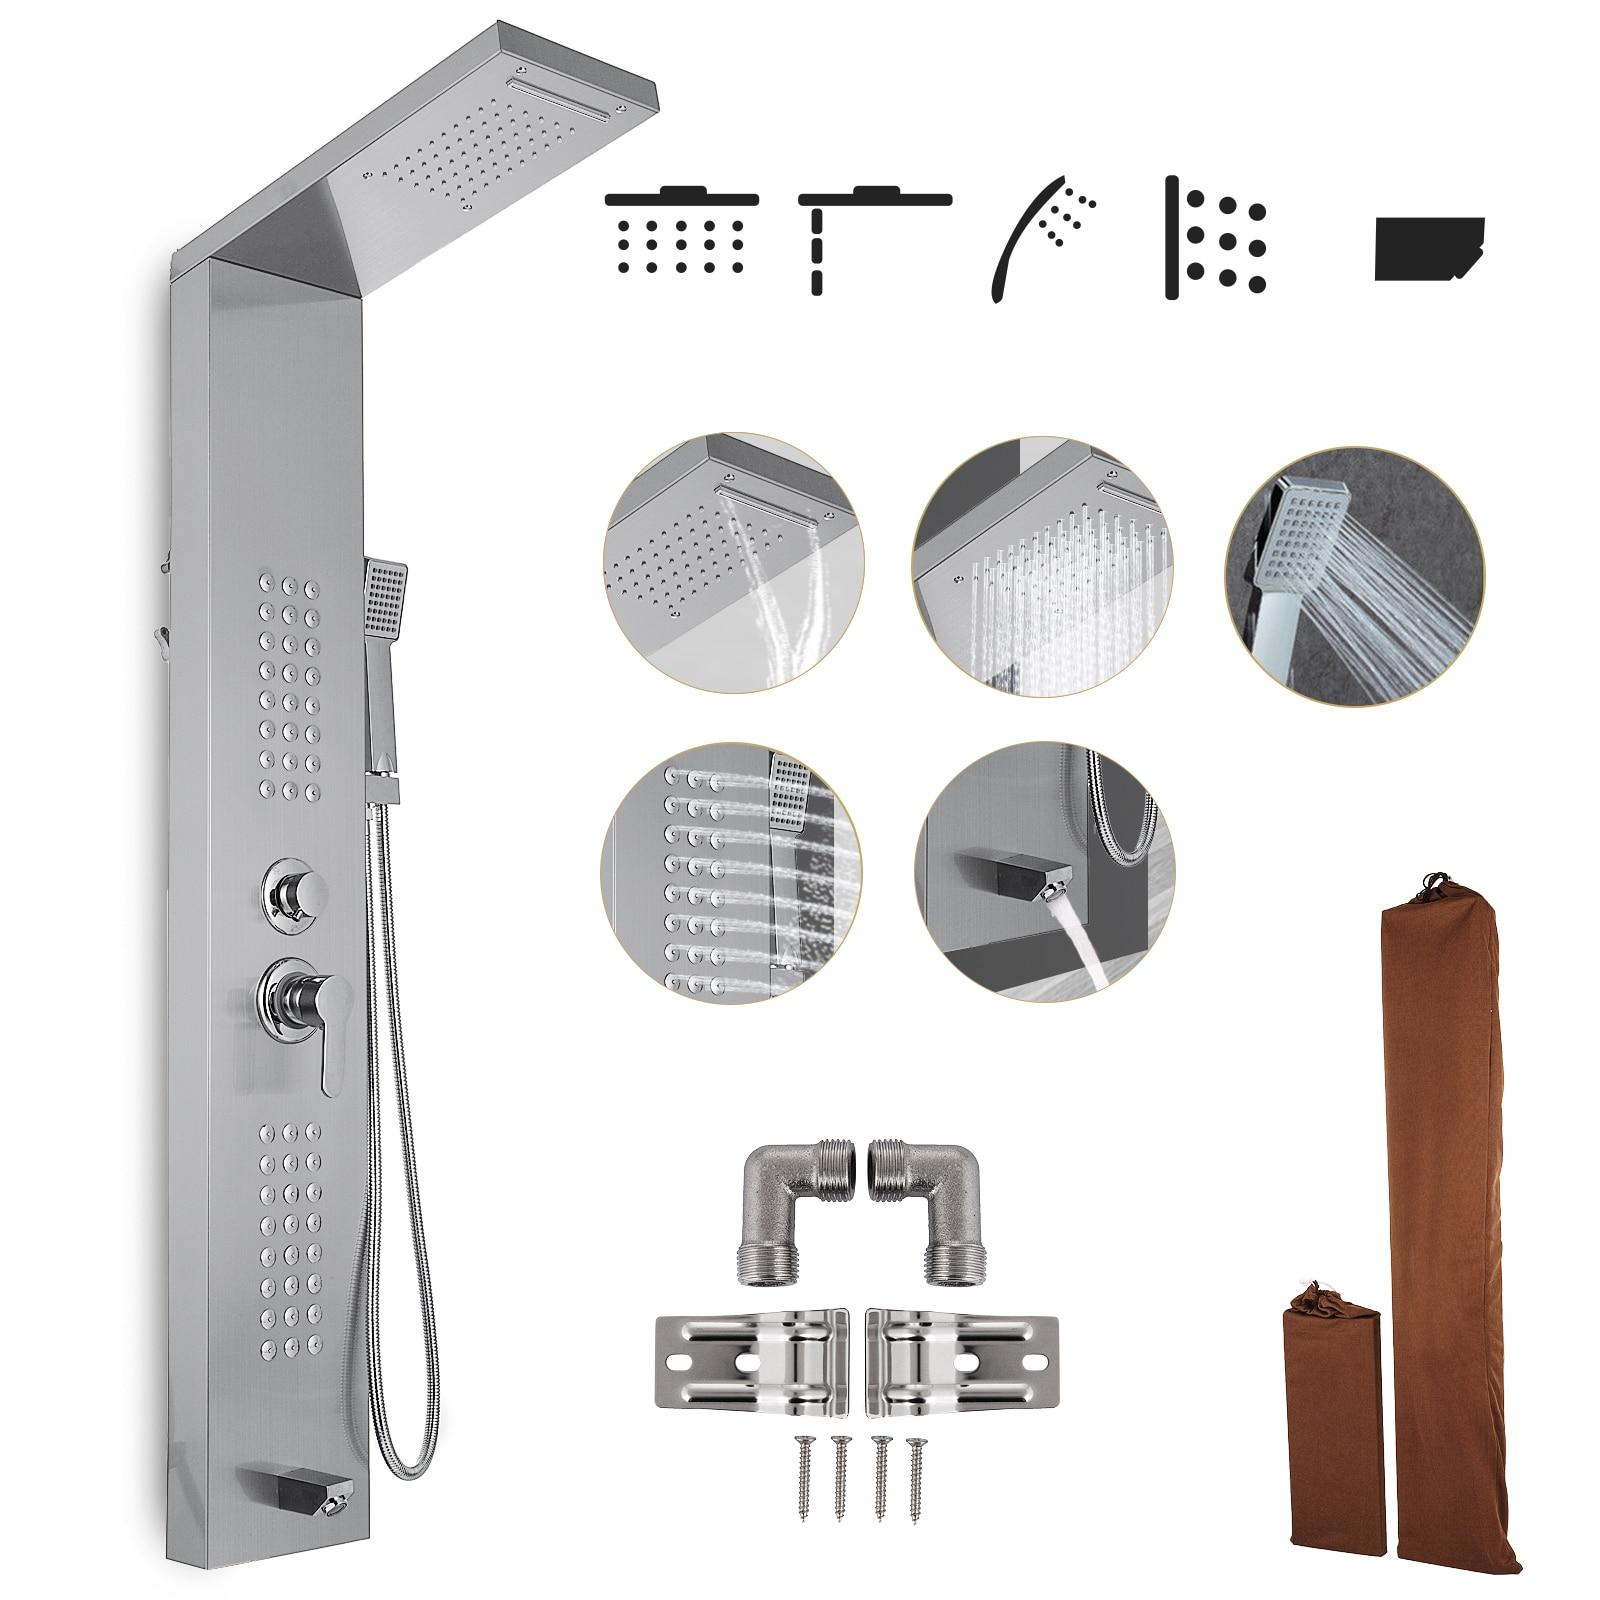 VEVOR الأمطار دش الاستحمام برج الفولاذ المقاوم للصدأ متعددة الوظائف دش الاستحمام نظام لوحات مع تدليك الجسم الطائرات حوض منتجع